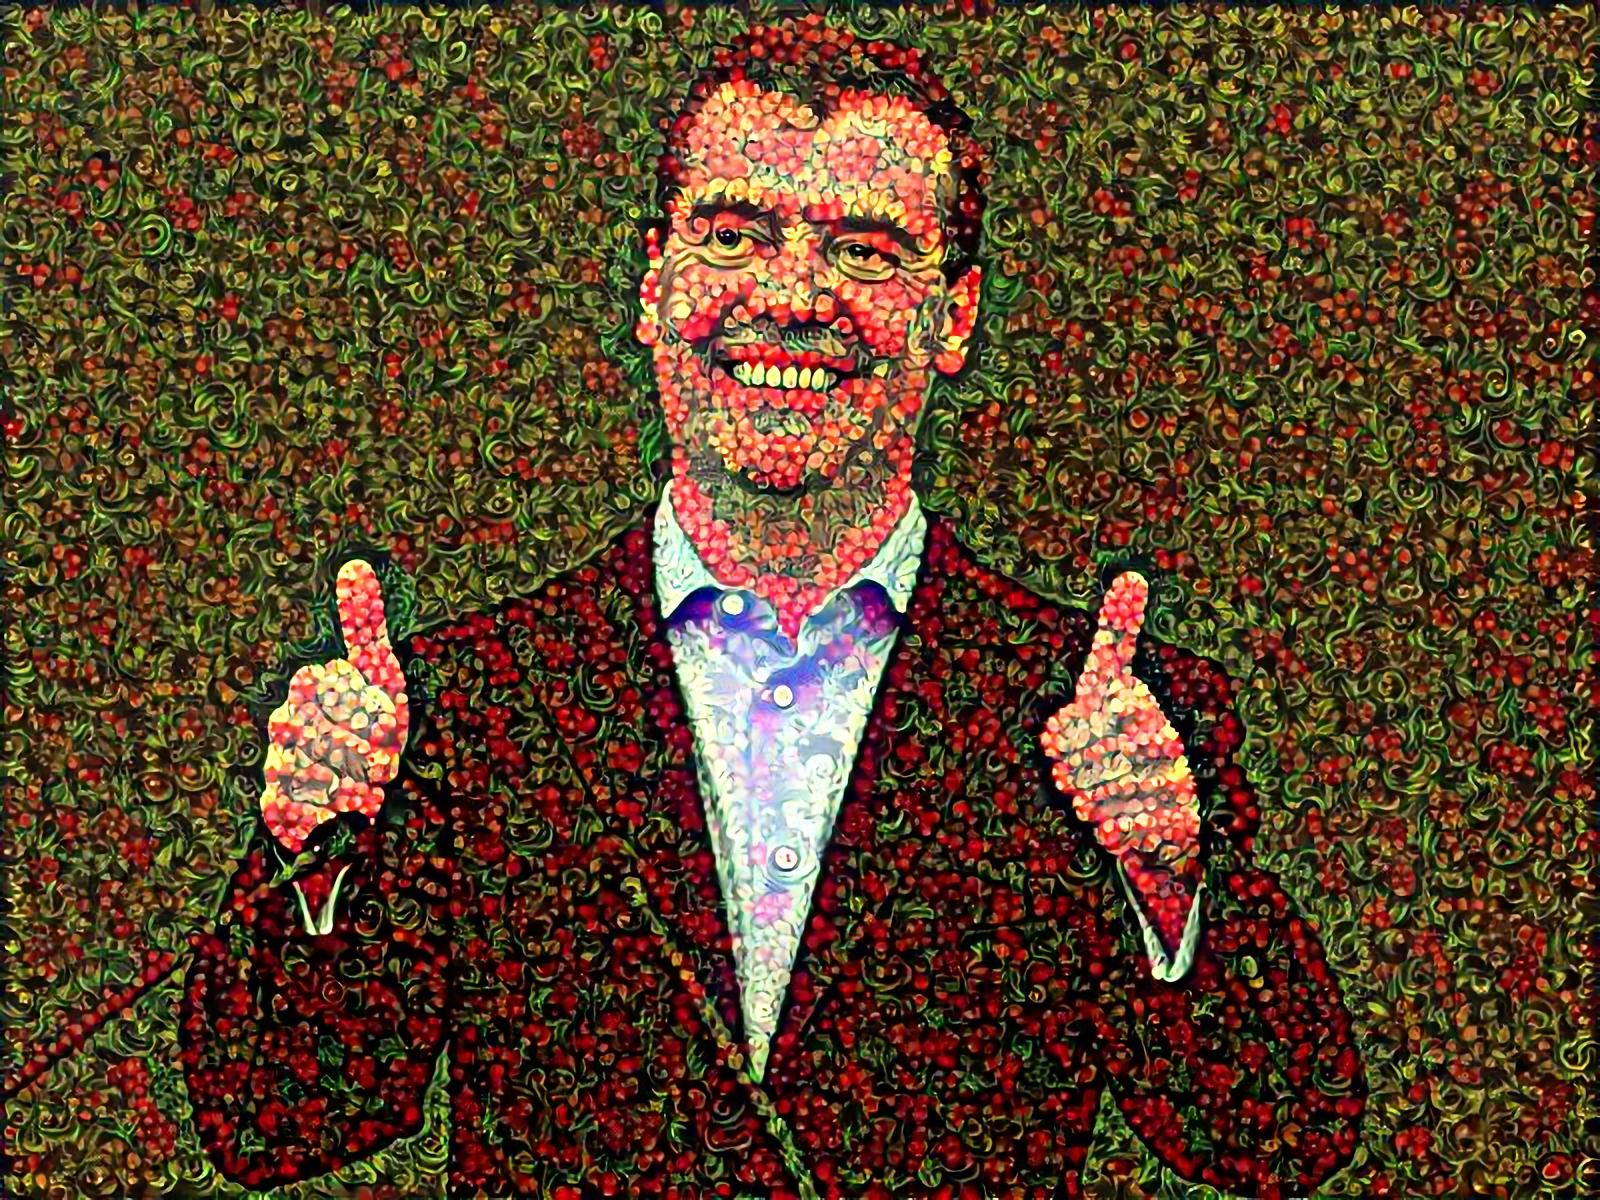 Медведев объявил о победе над кризисом на фоне обнищания 20 млн россиян20